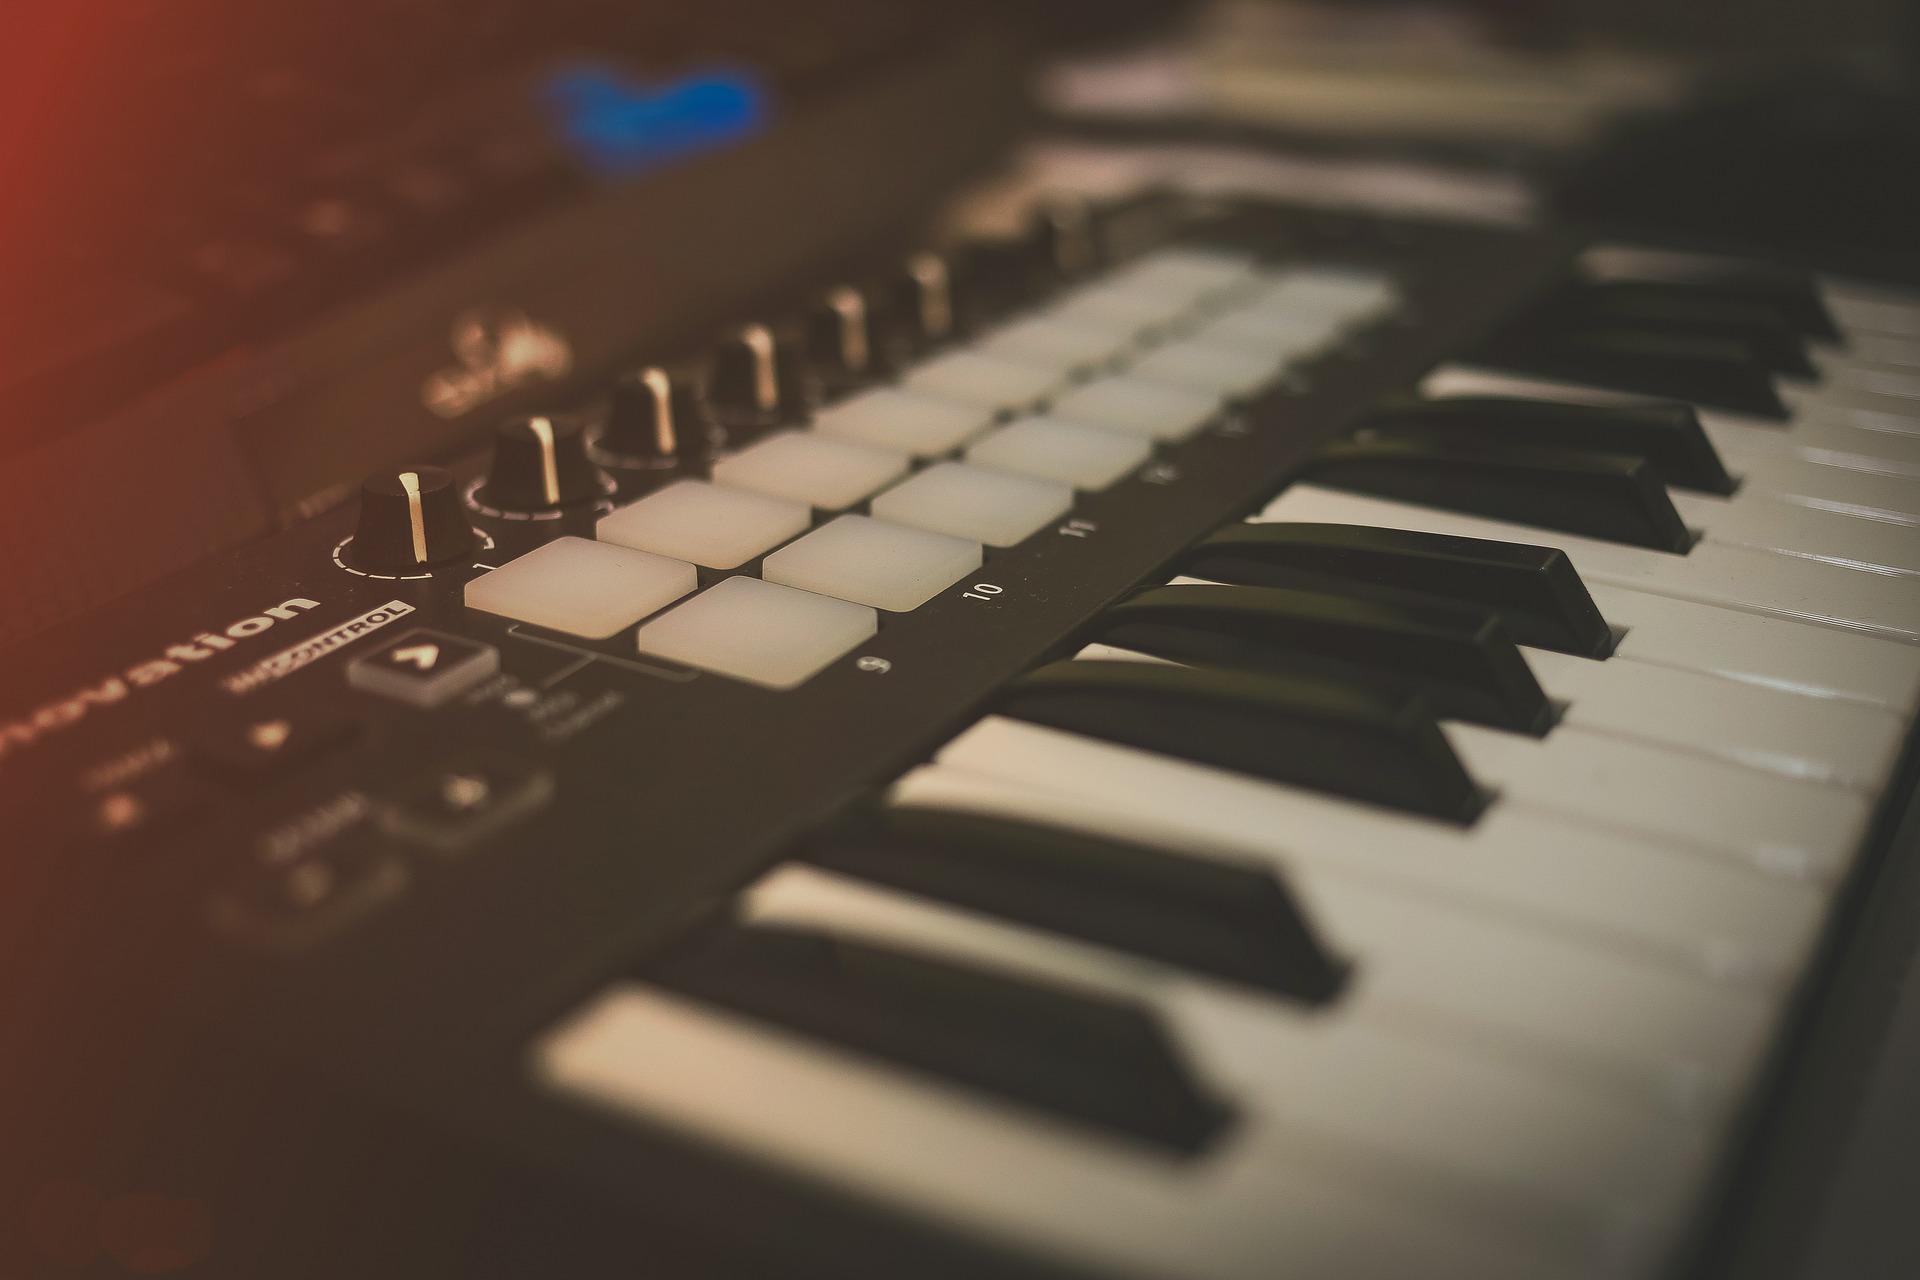 Virtual Instruments and MIDI